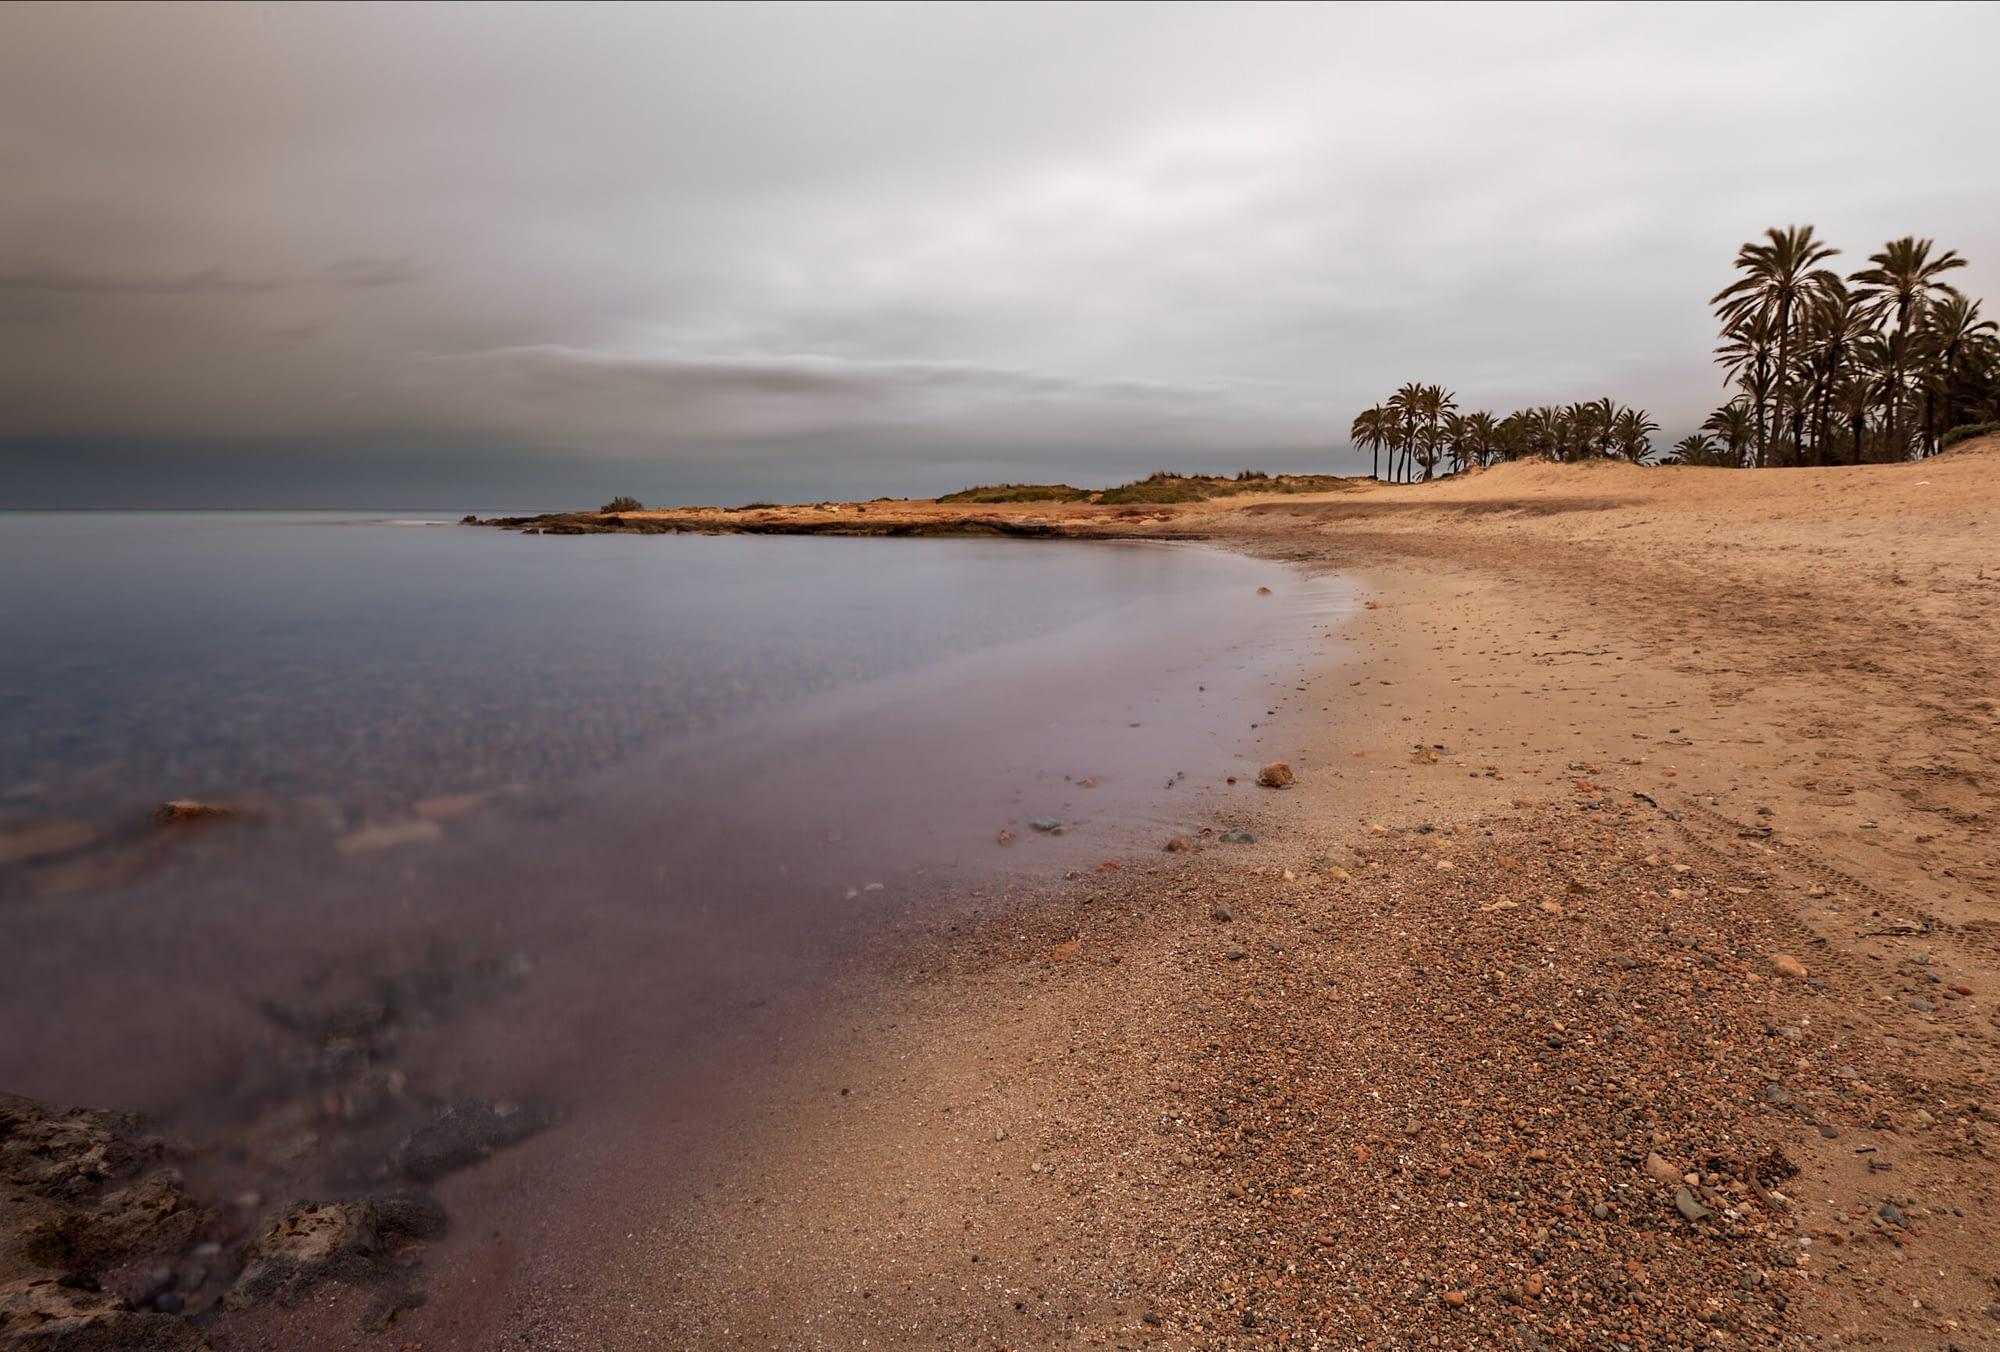 Cala de Torrevieja 2 - Landscape Photography by Jose Luis Durante Molina